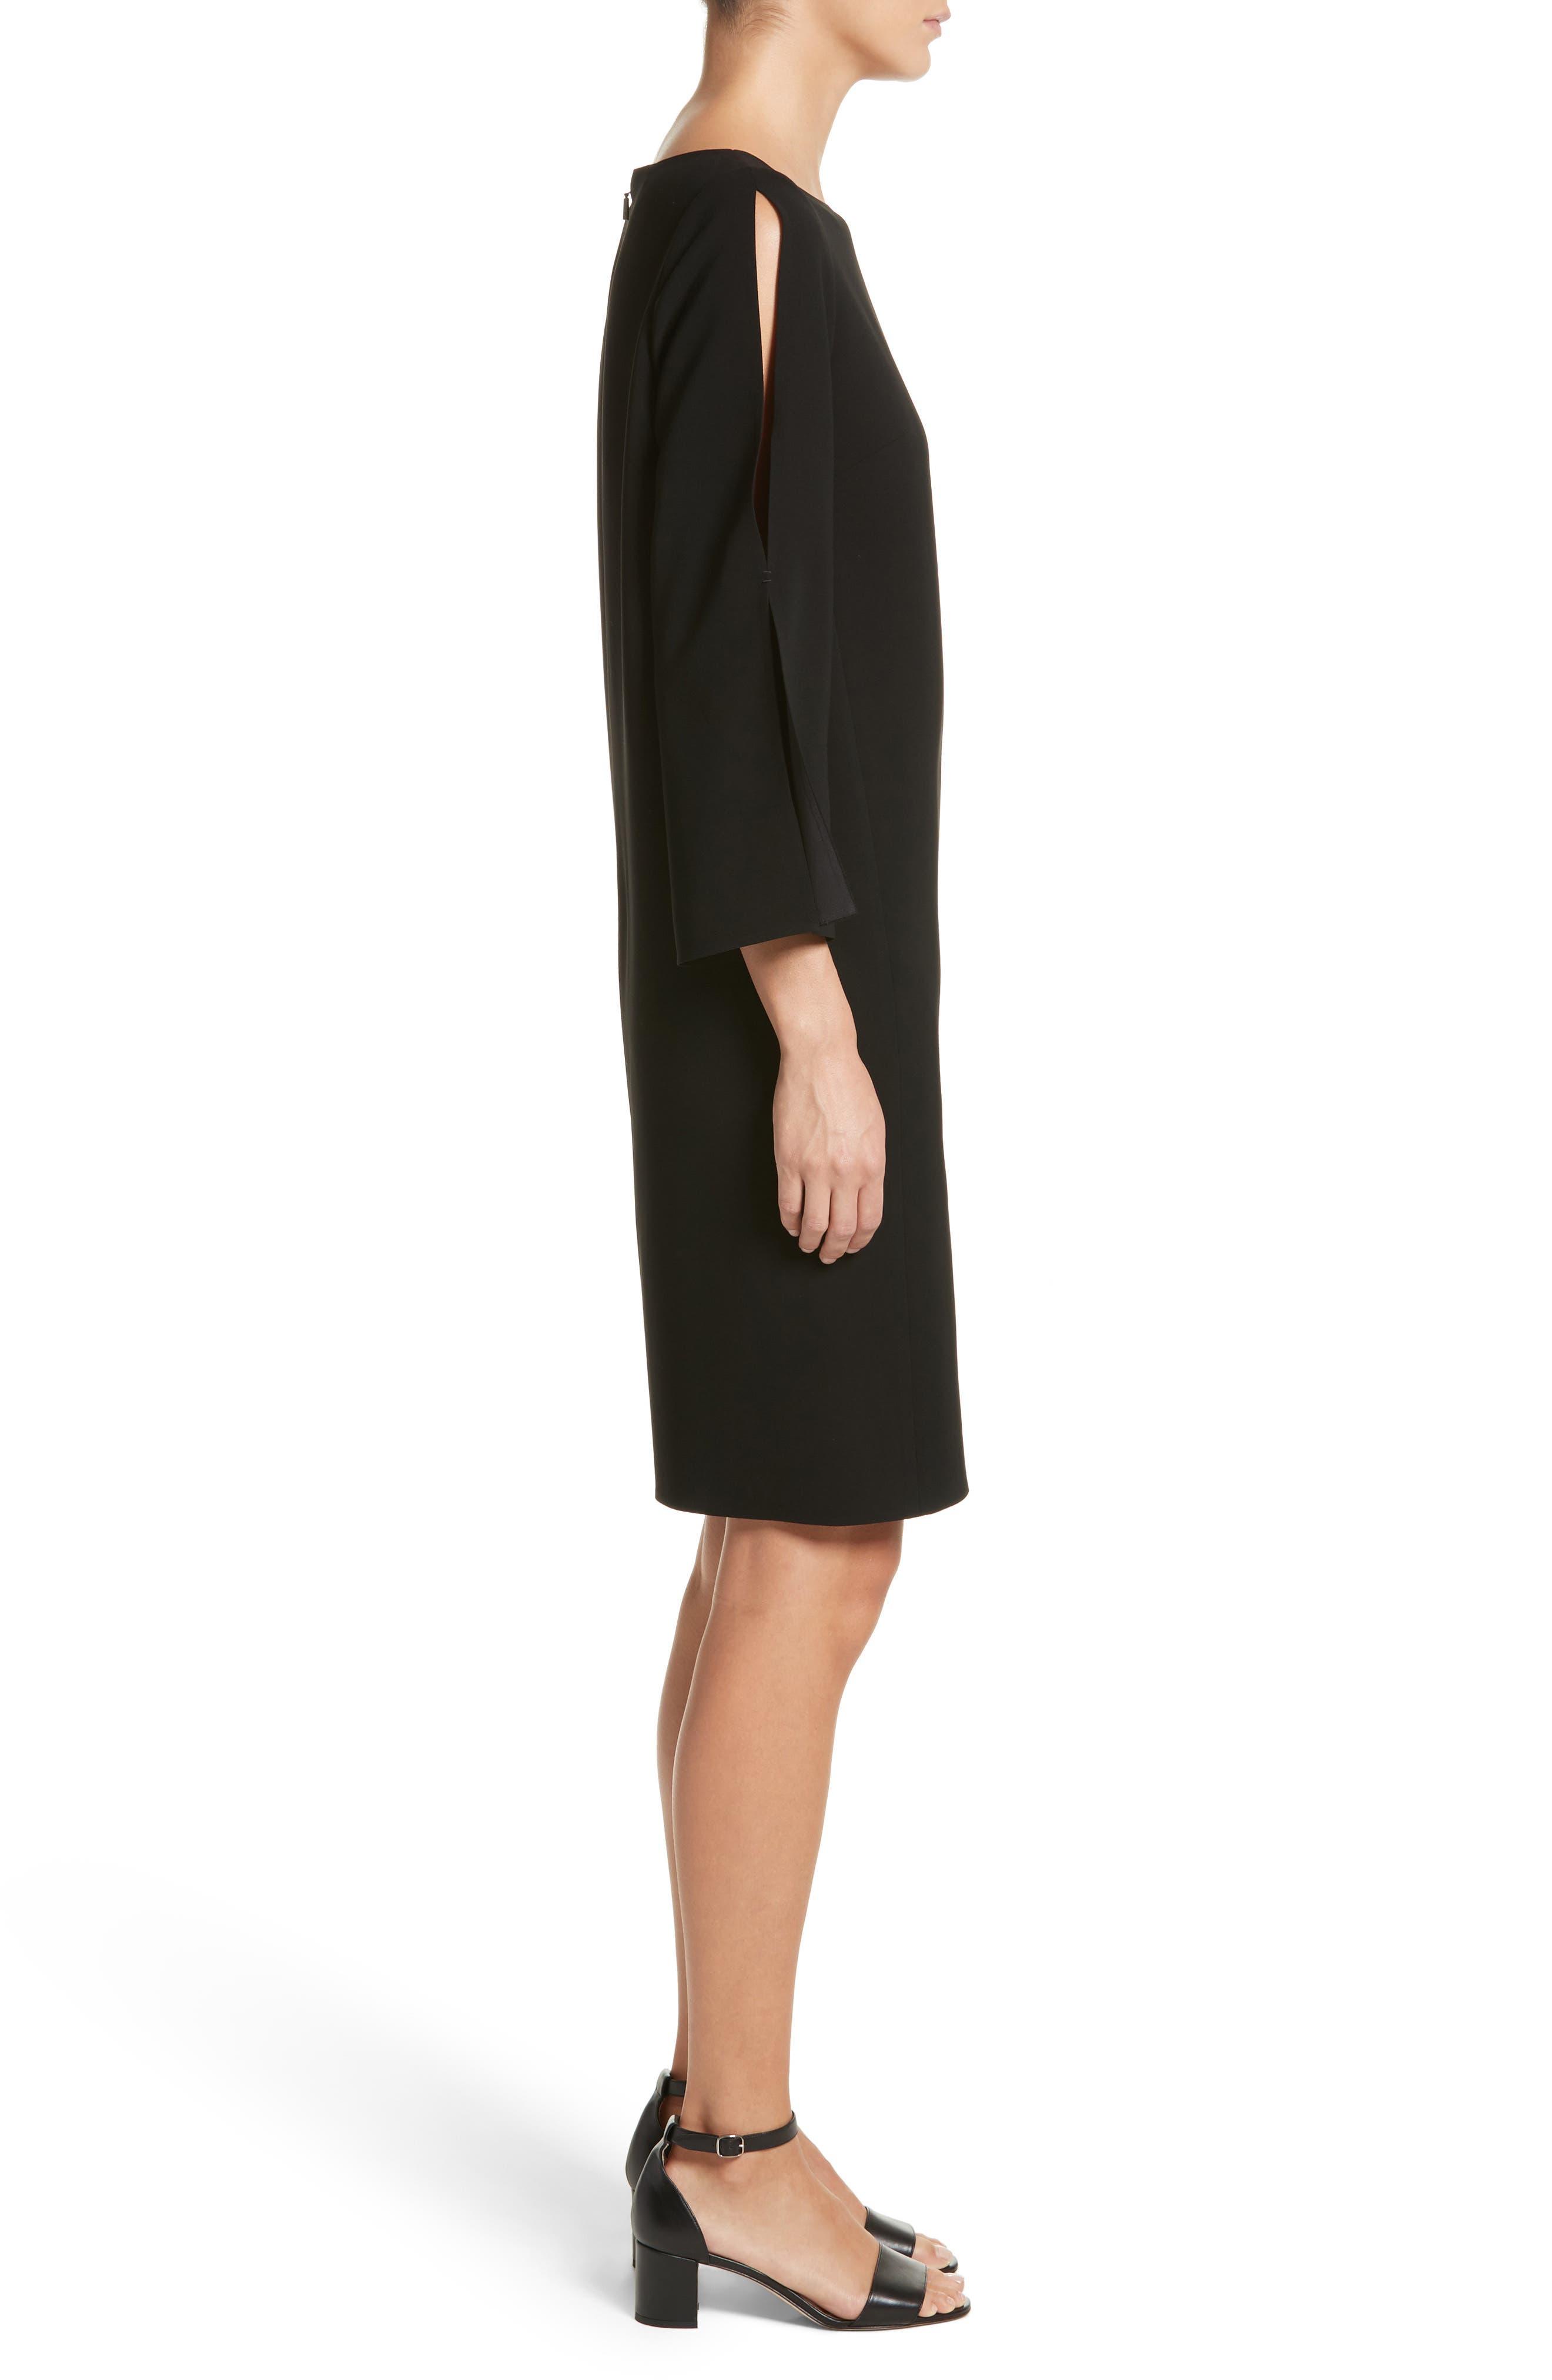 Candace Finesse Crepe Shift Dress,                             Alternate thumbnail 3, color,                             Black